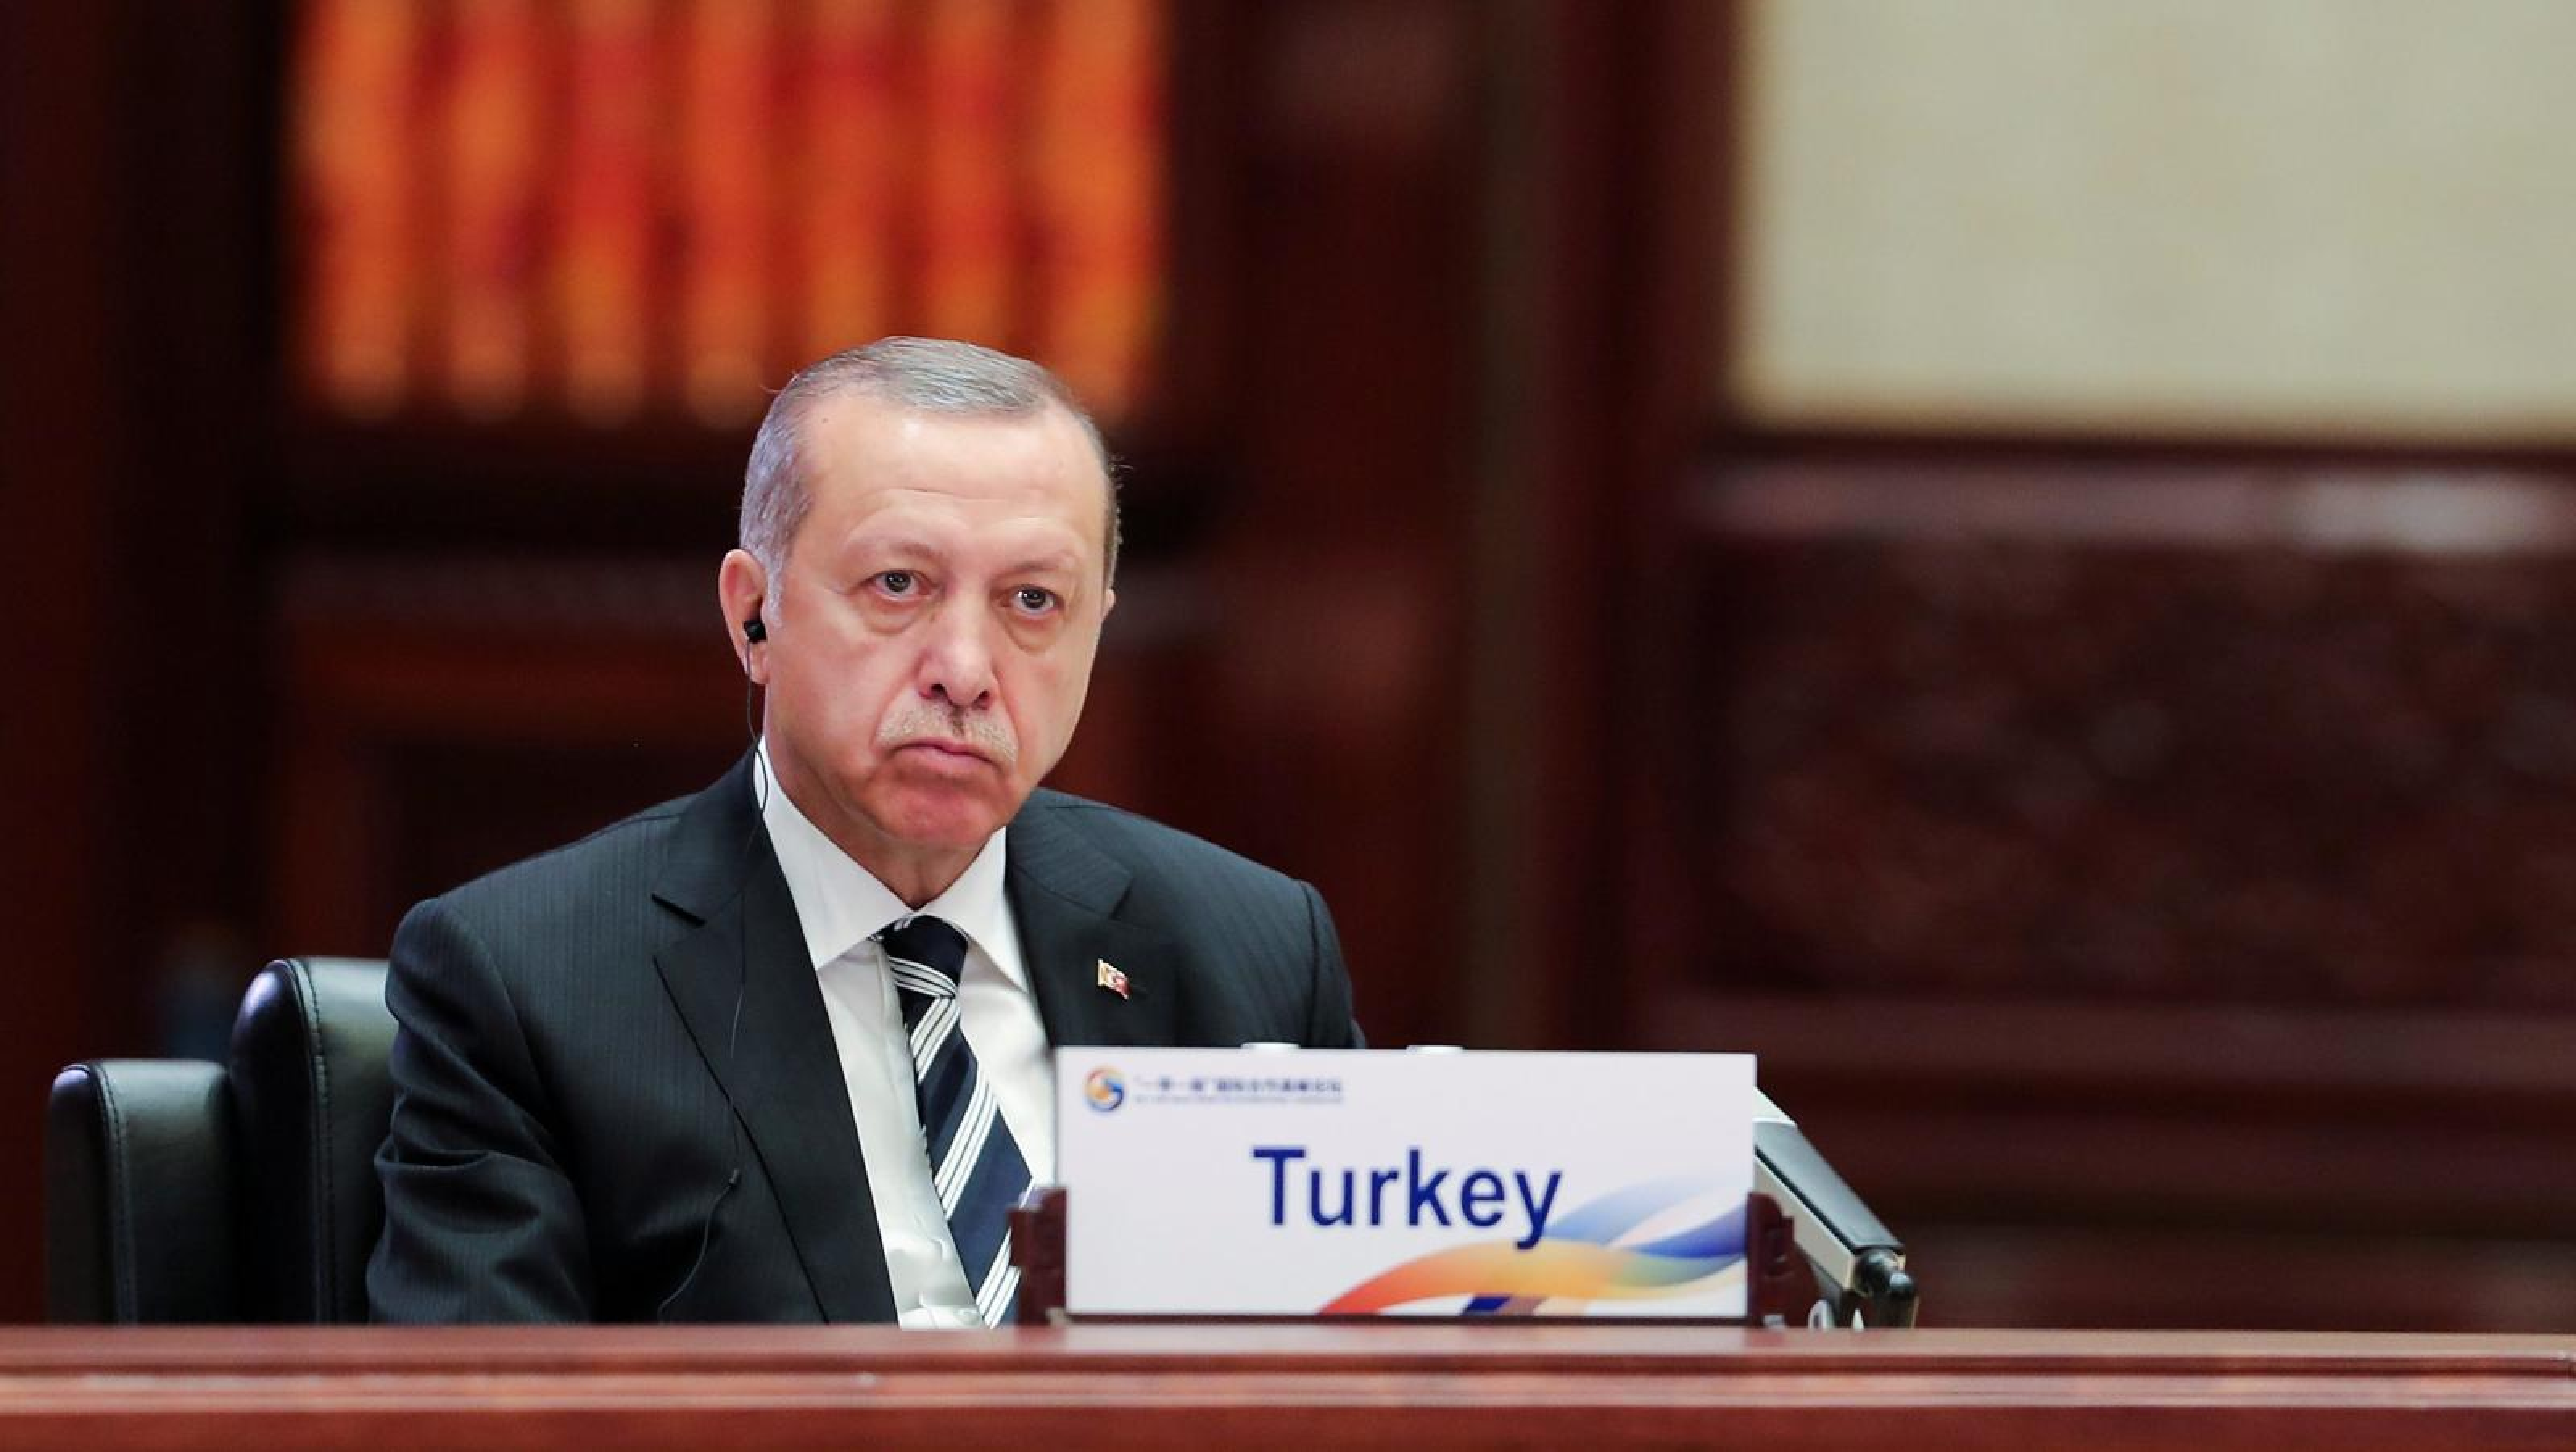 New Video Shows Turkish President Recep Tayyip Erodogan Watching His